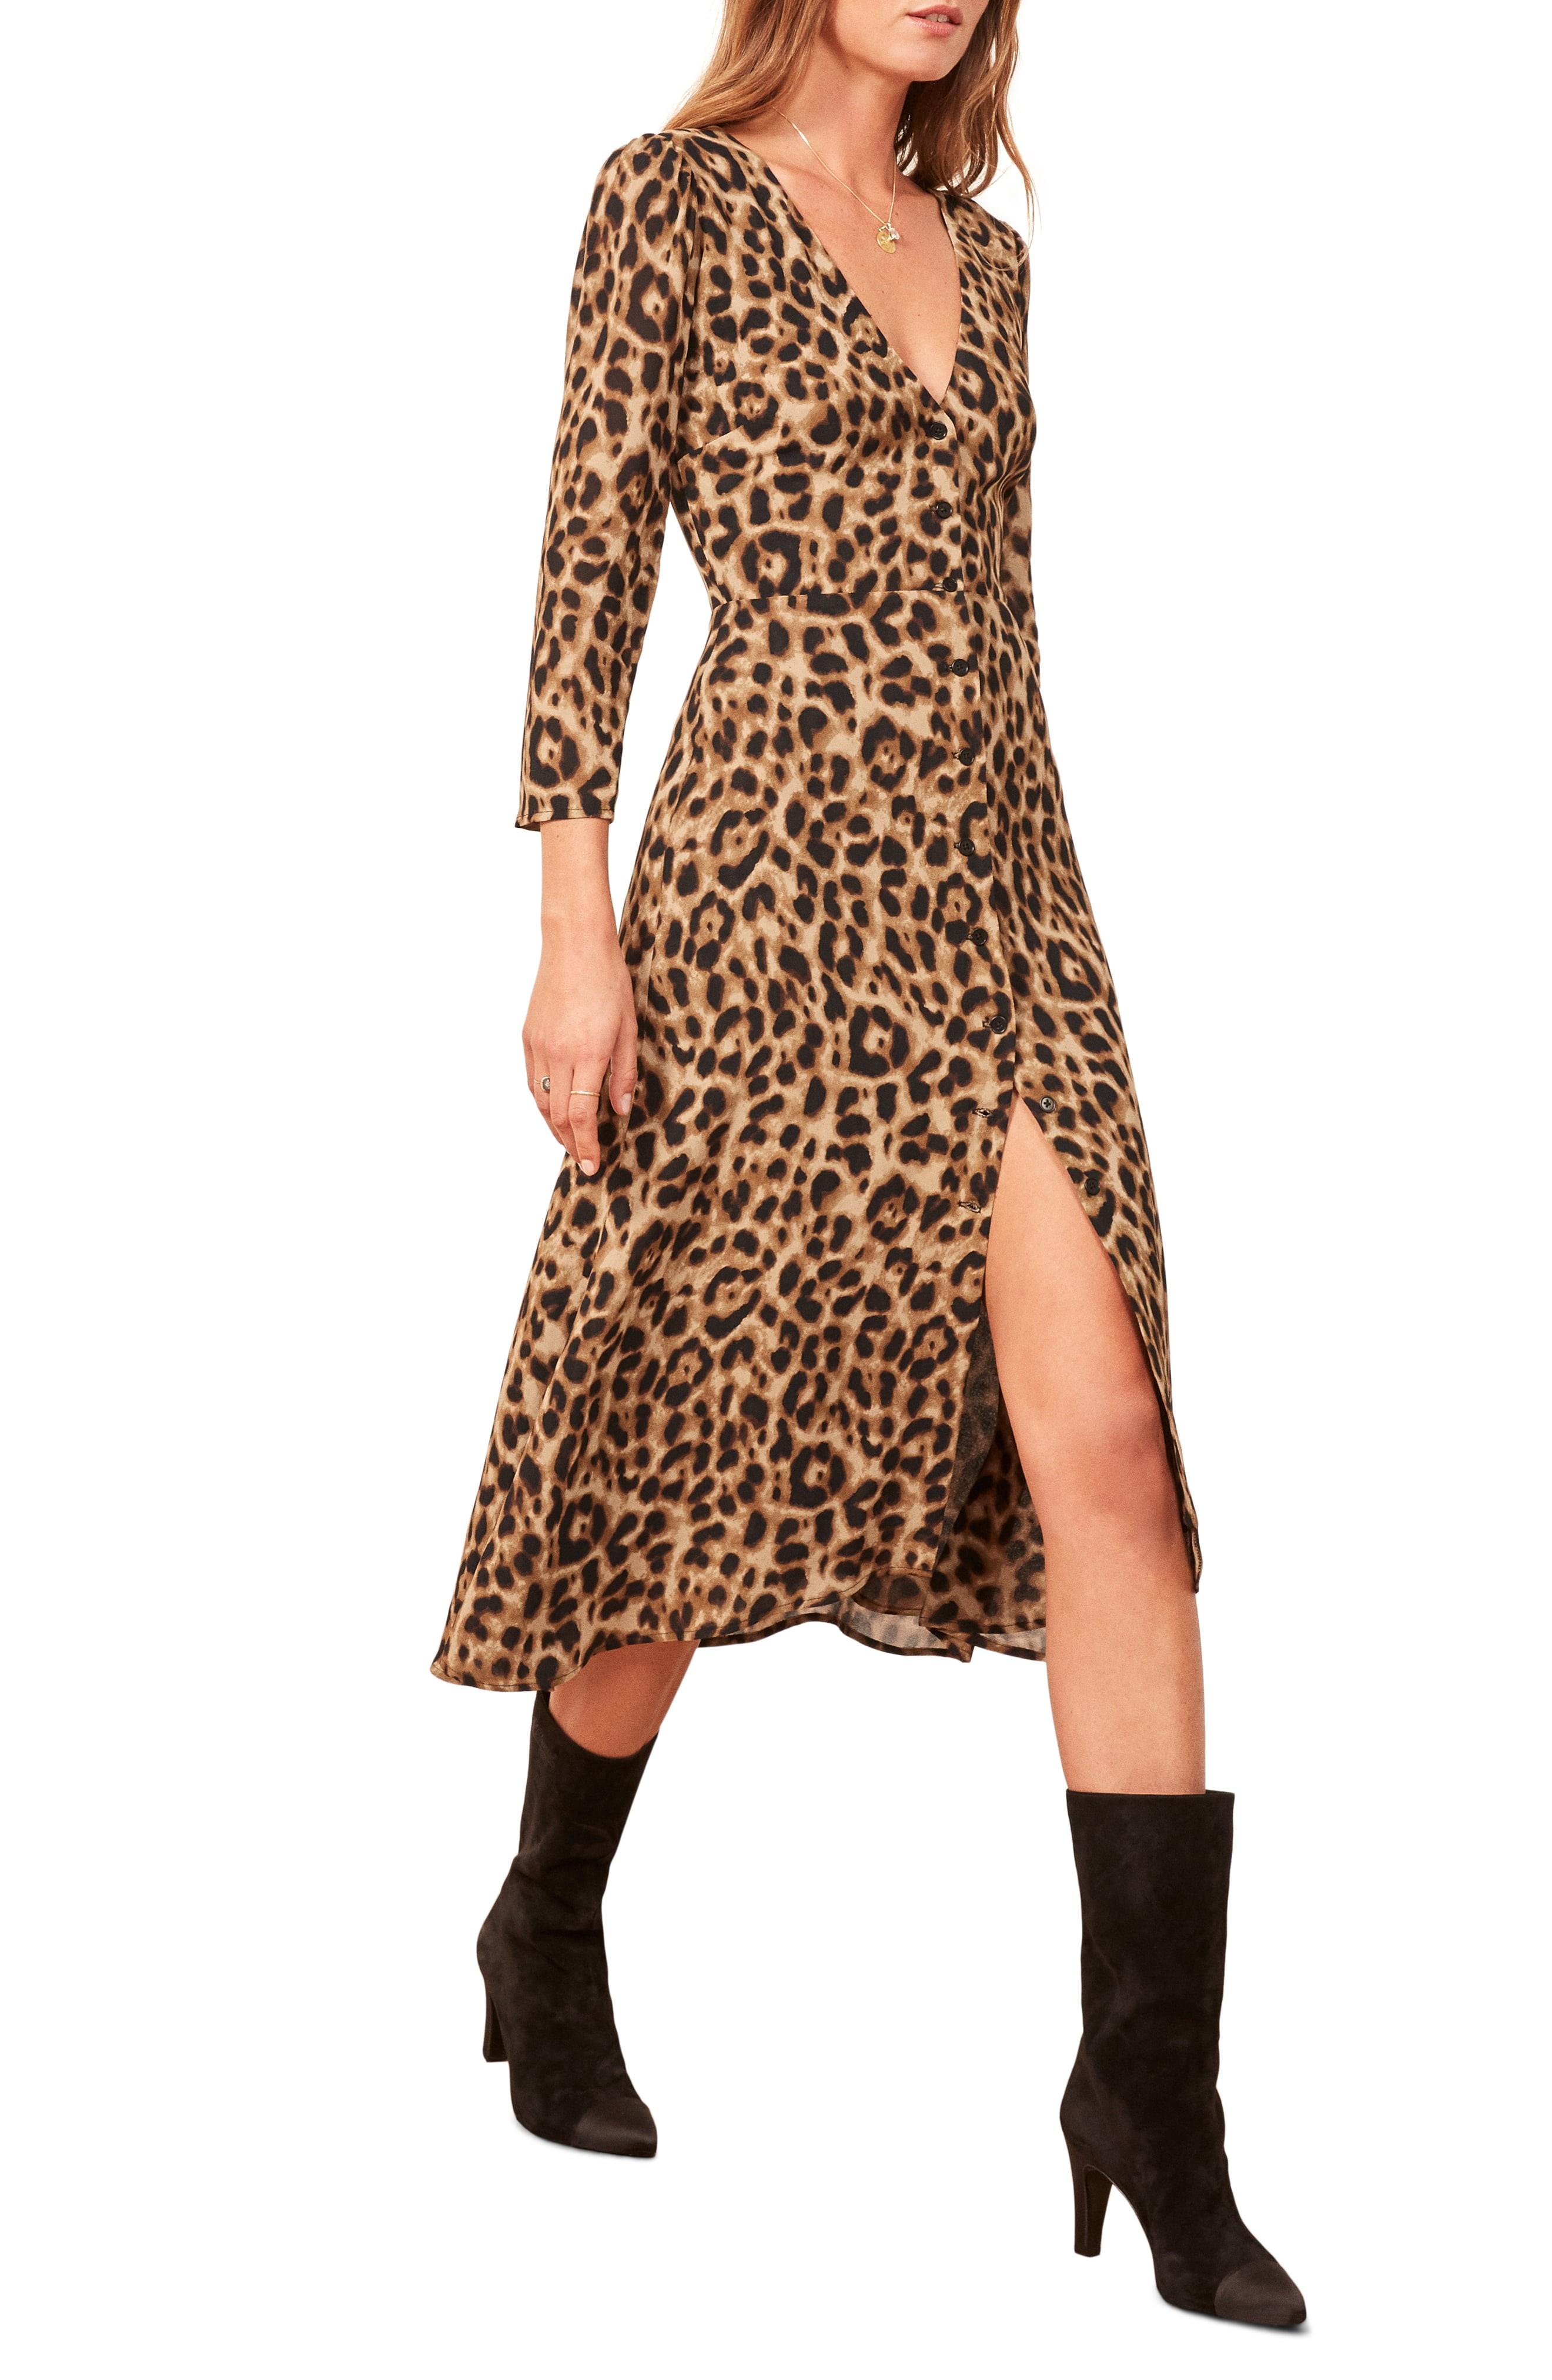 bc71e738eed3 Chase Amie - A luxury fashion